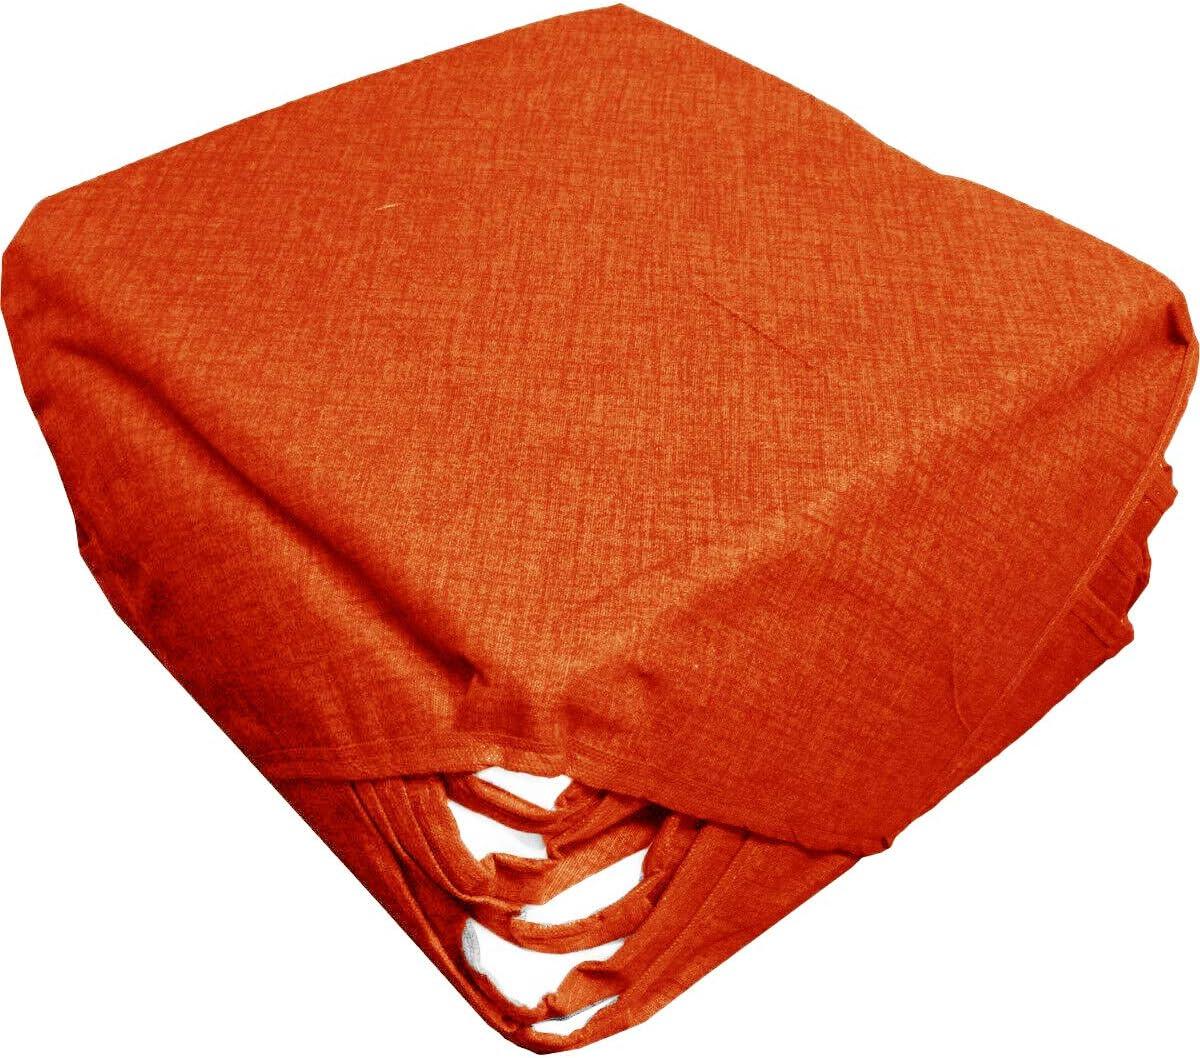 Russo Tessuti 6 Cuscini Sedie Cucina Coprisedia Imbottiti Tinta Unita Vari Colori Alette Arancione